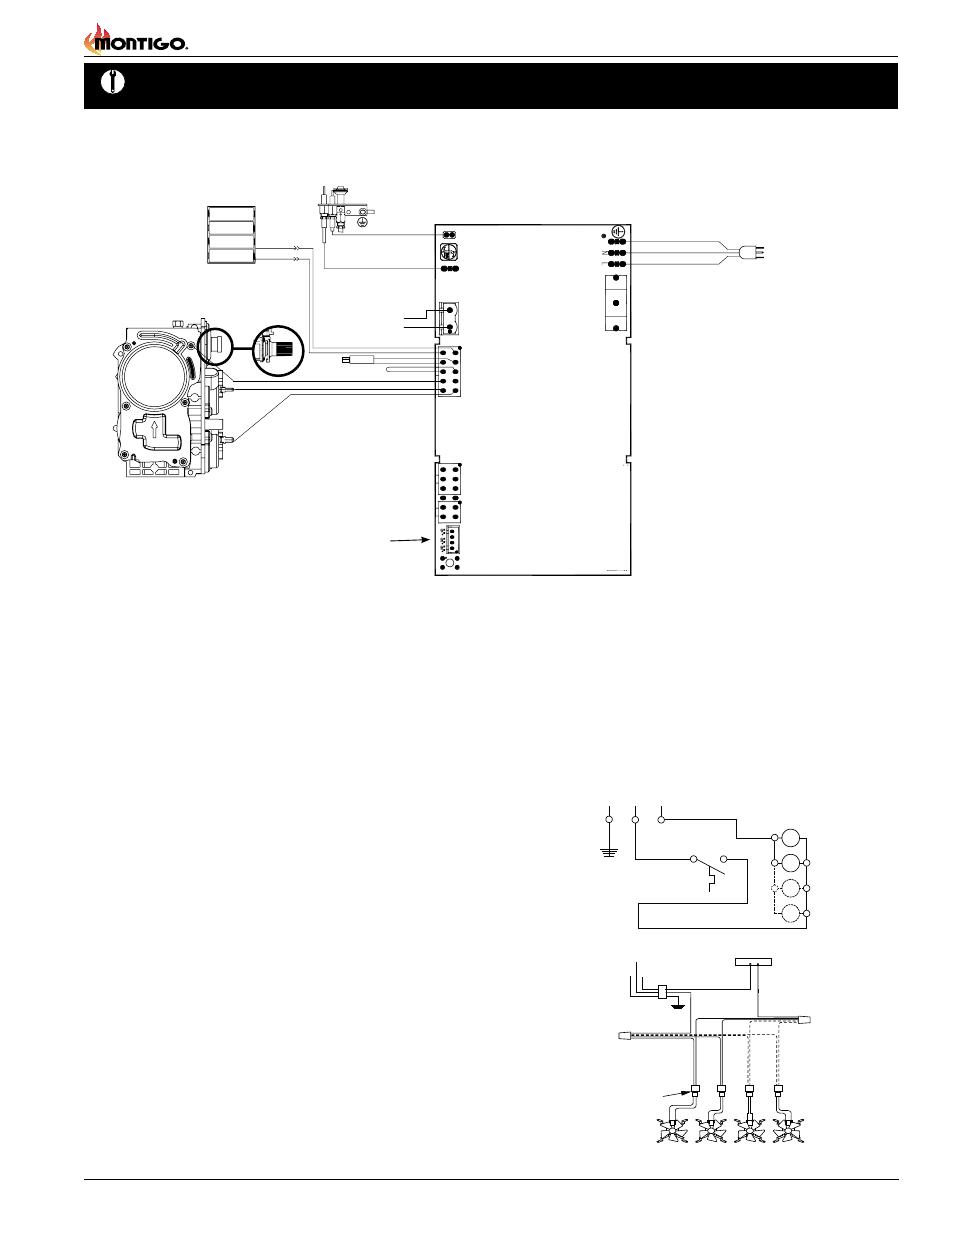 Installation Wiring Page 13 B Series Dv 2 Gas Fireplace Montigo Firep Diagram Background Image